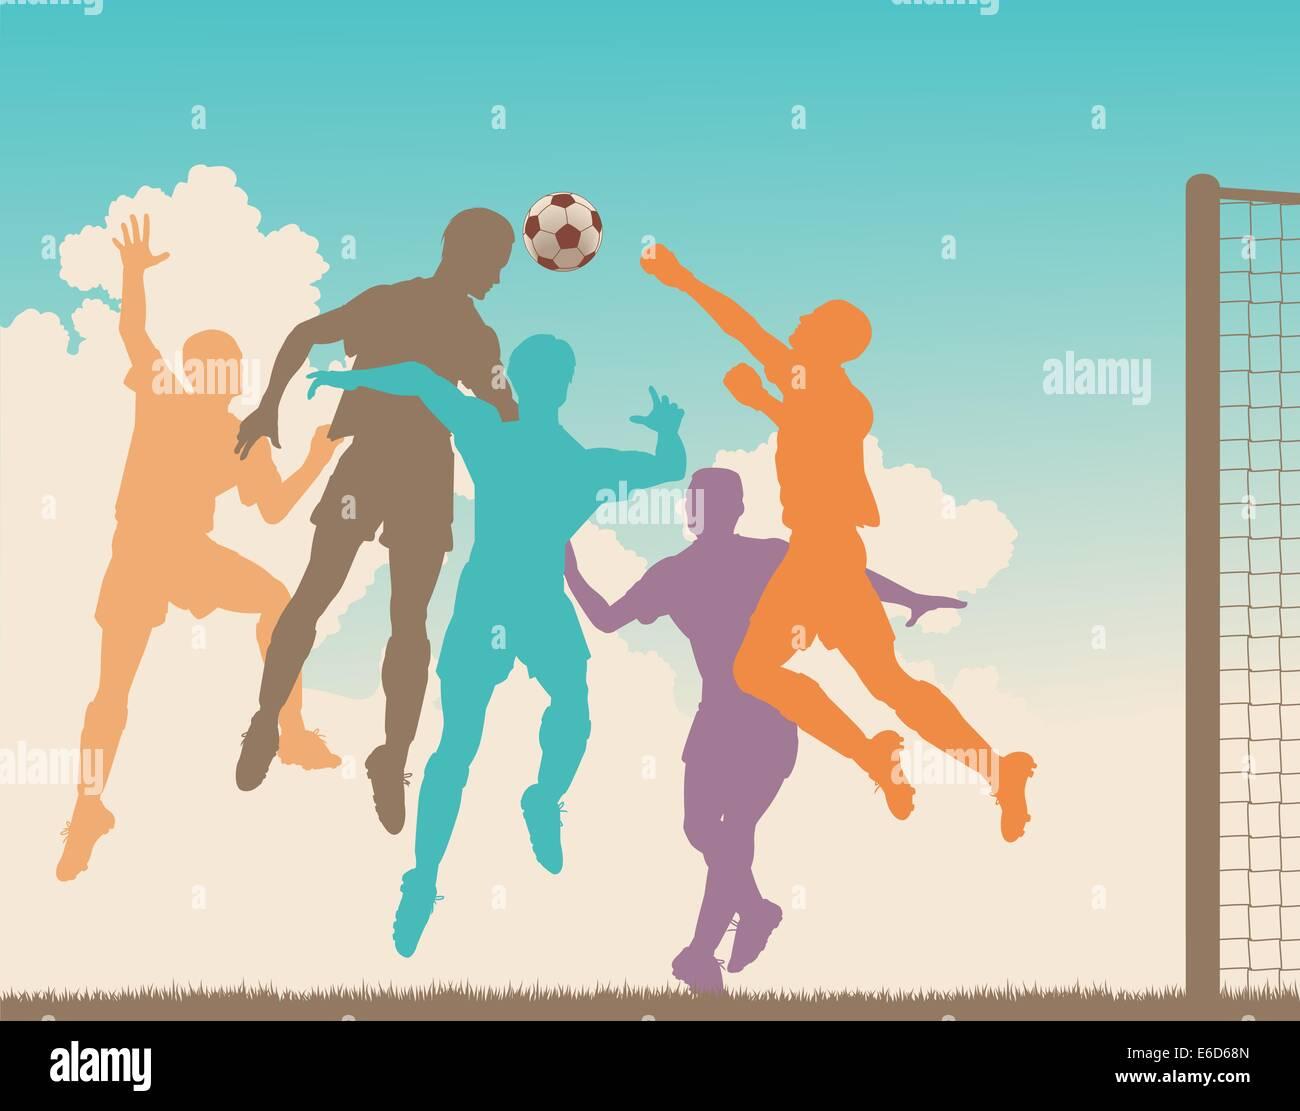 Colorful editable vector silhouette of a footballer heading the ball at goal - Stock Vector